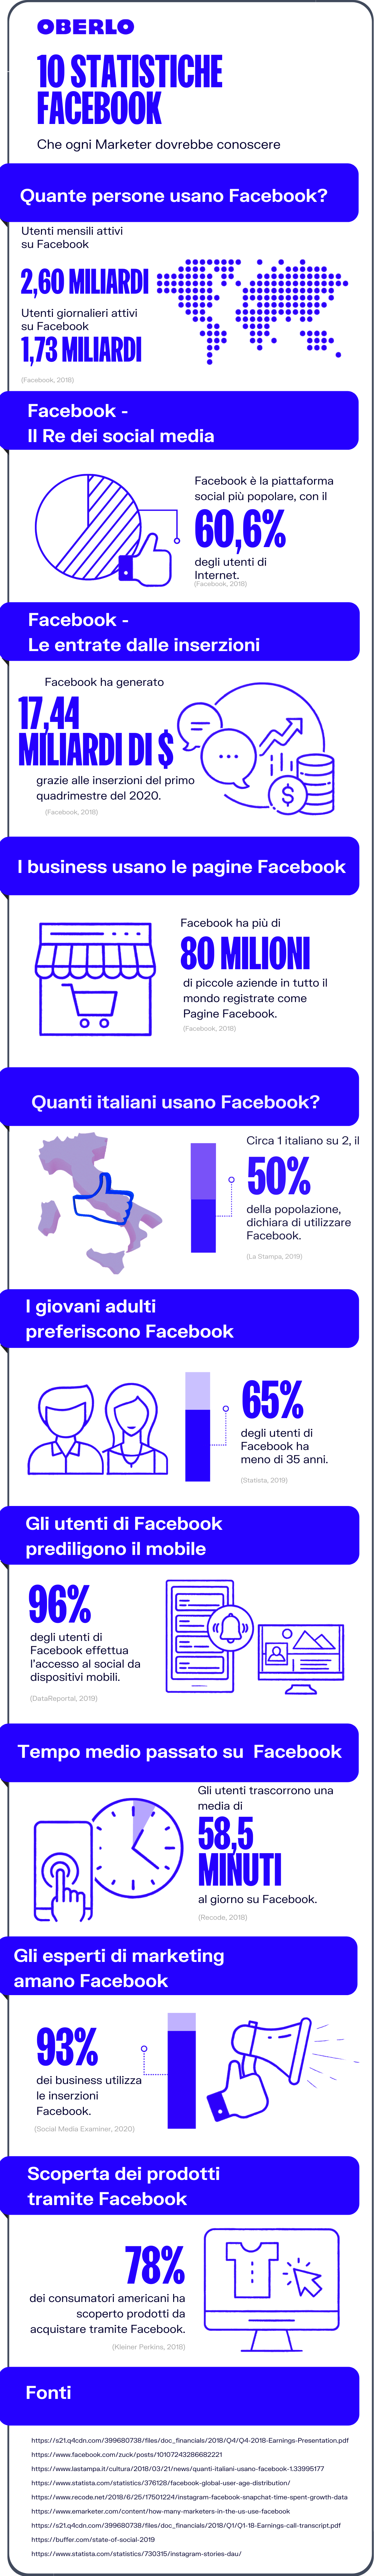 statistiche facebook 2020